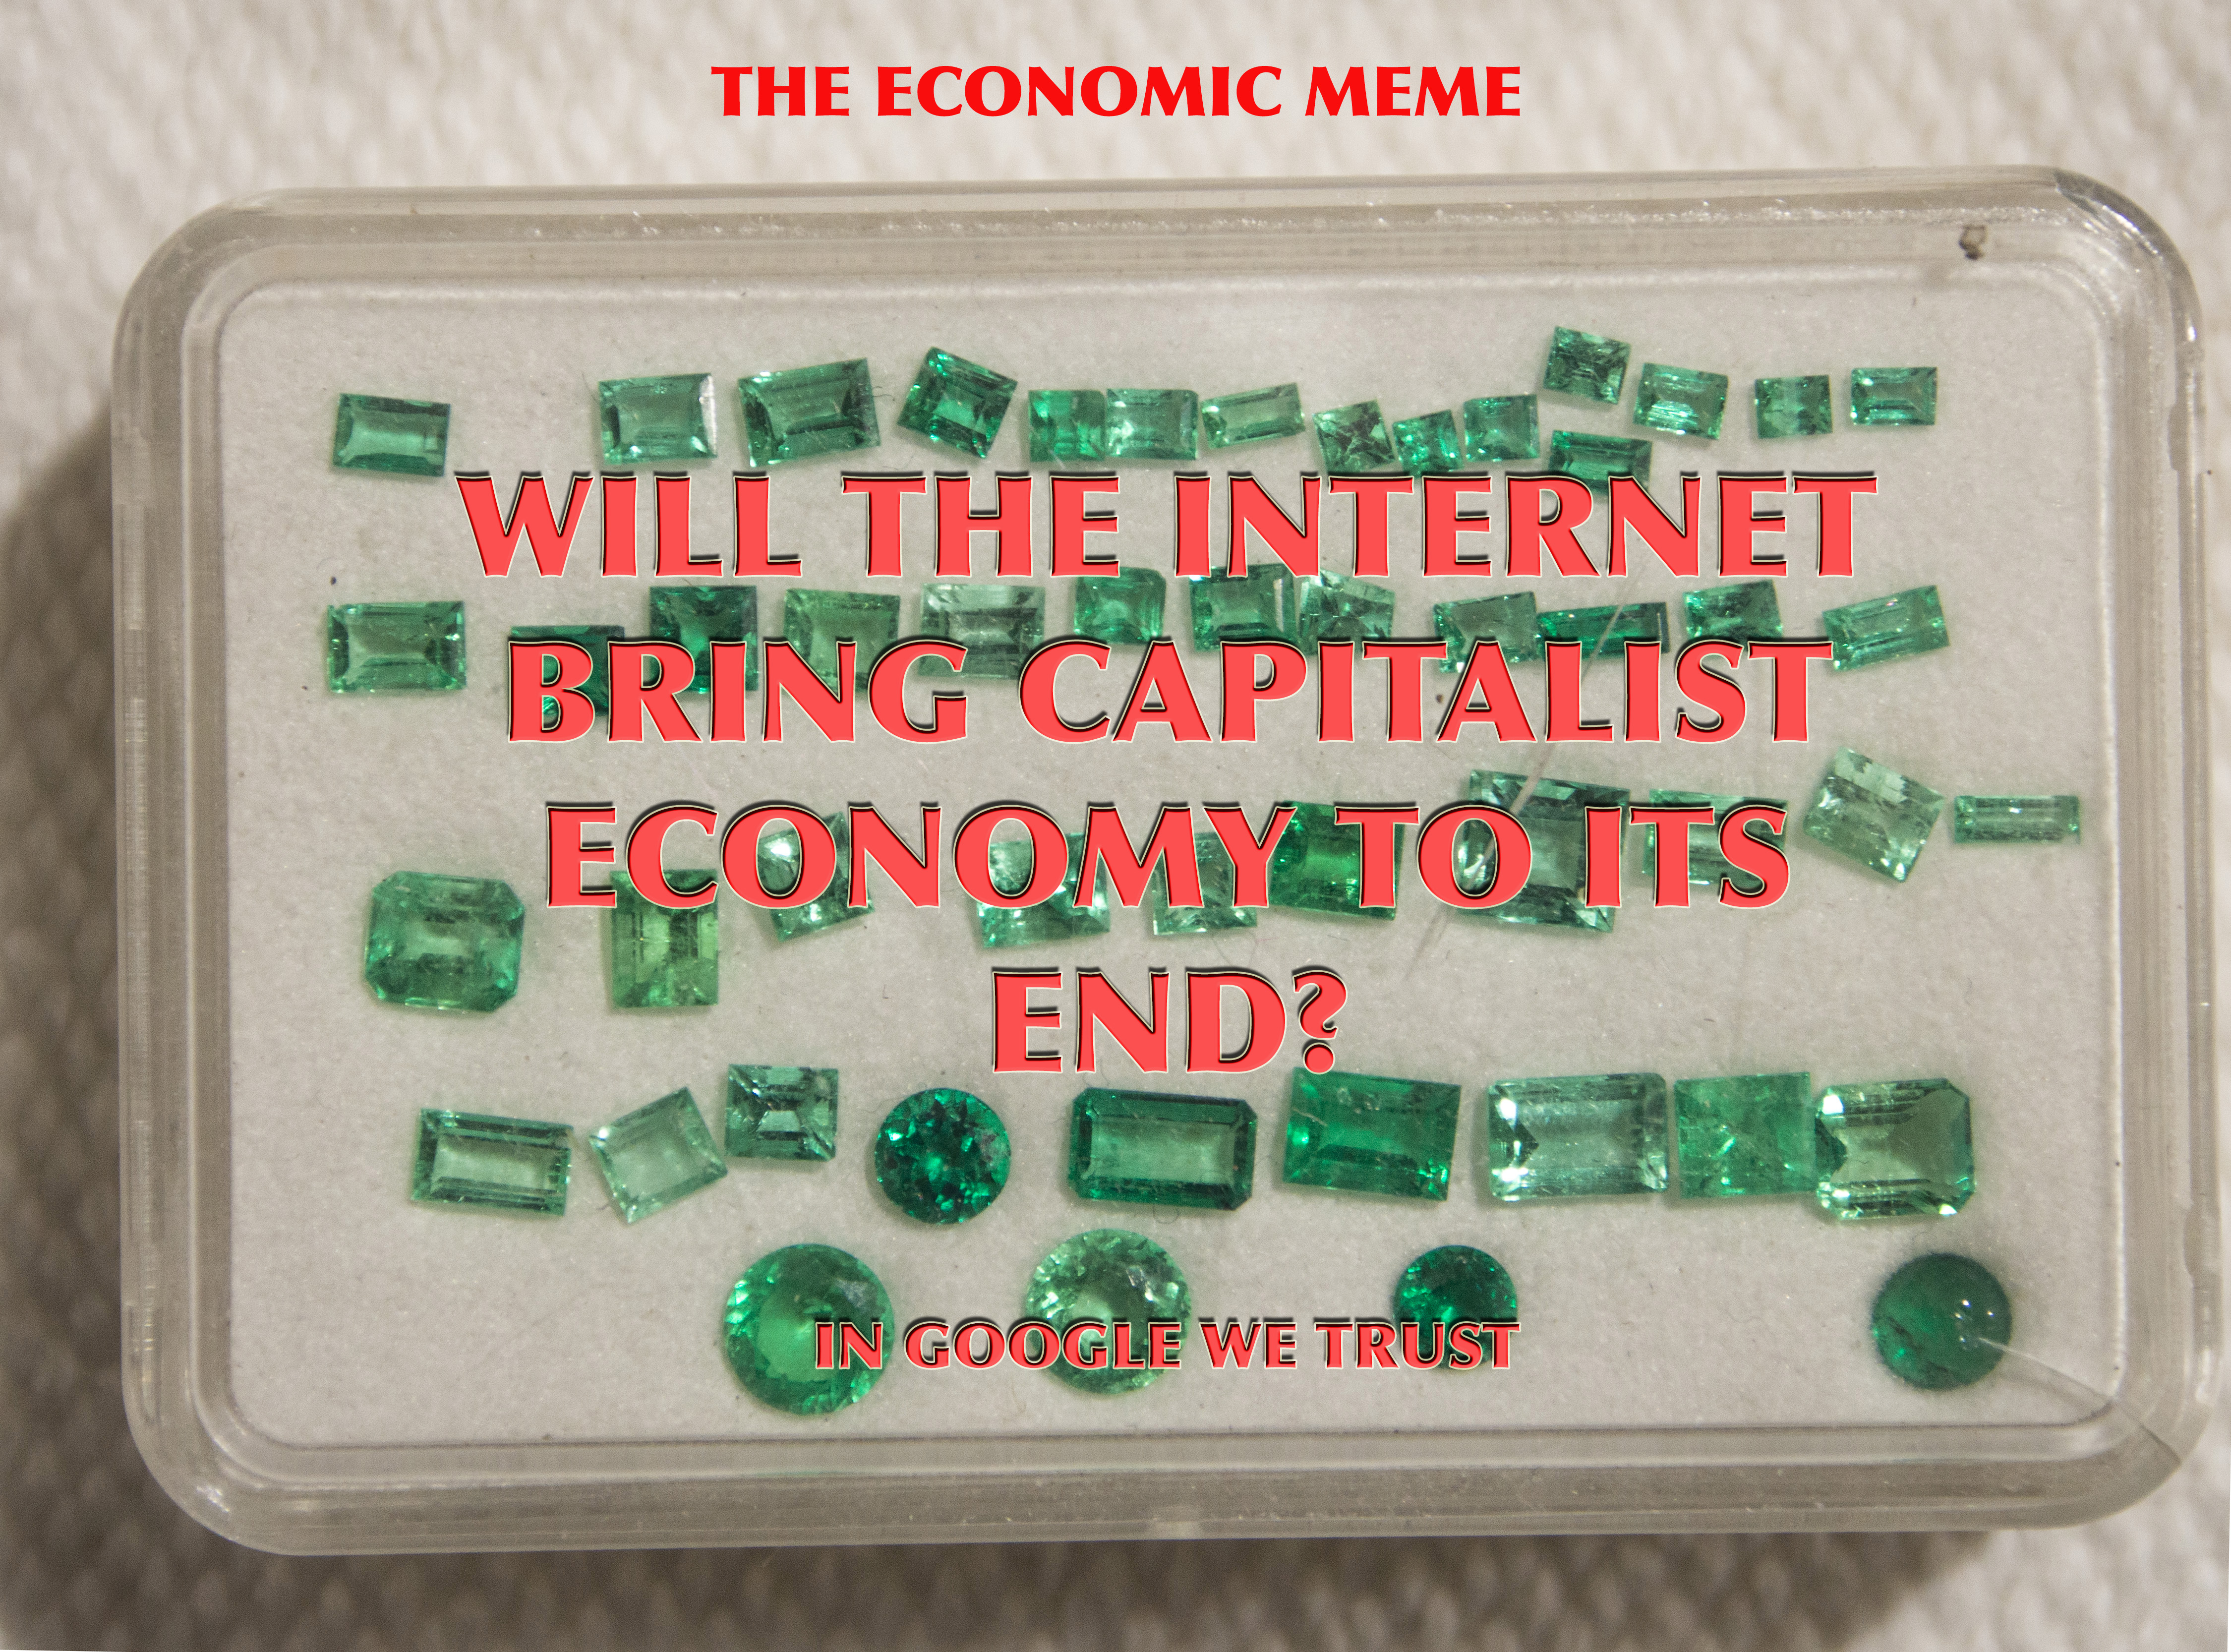 CPITALISt ECONOMY